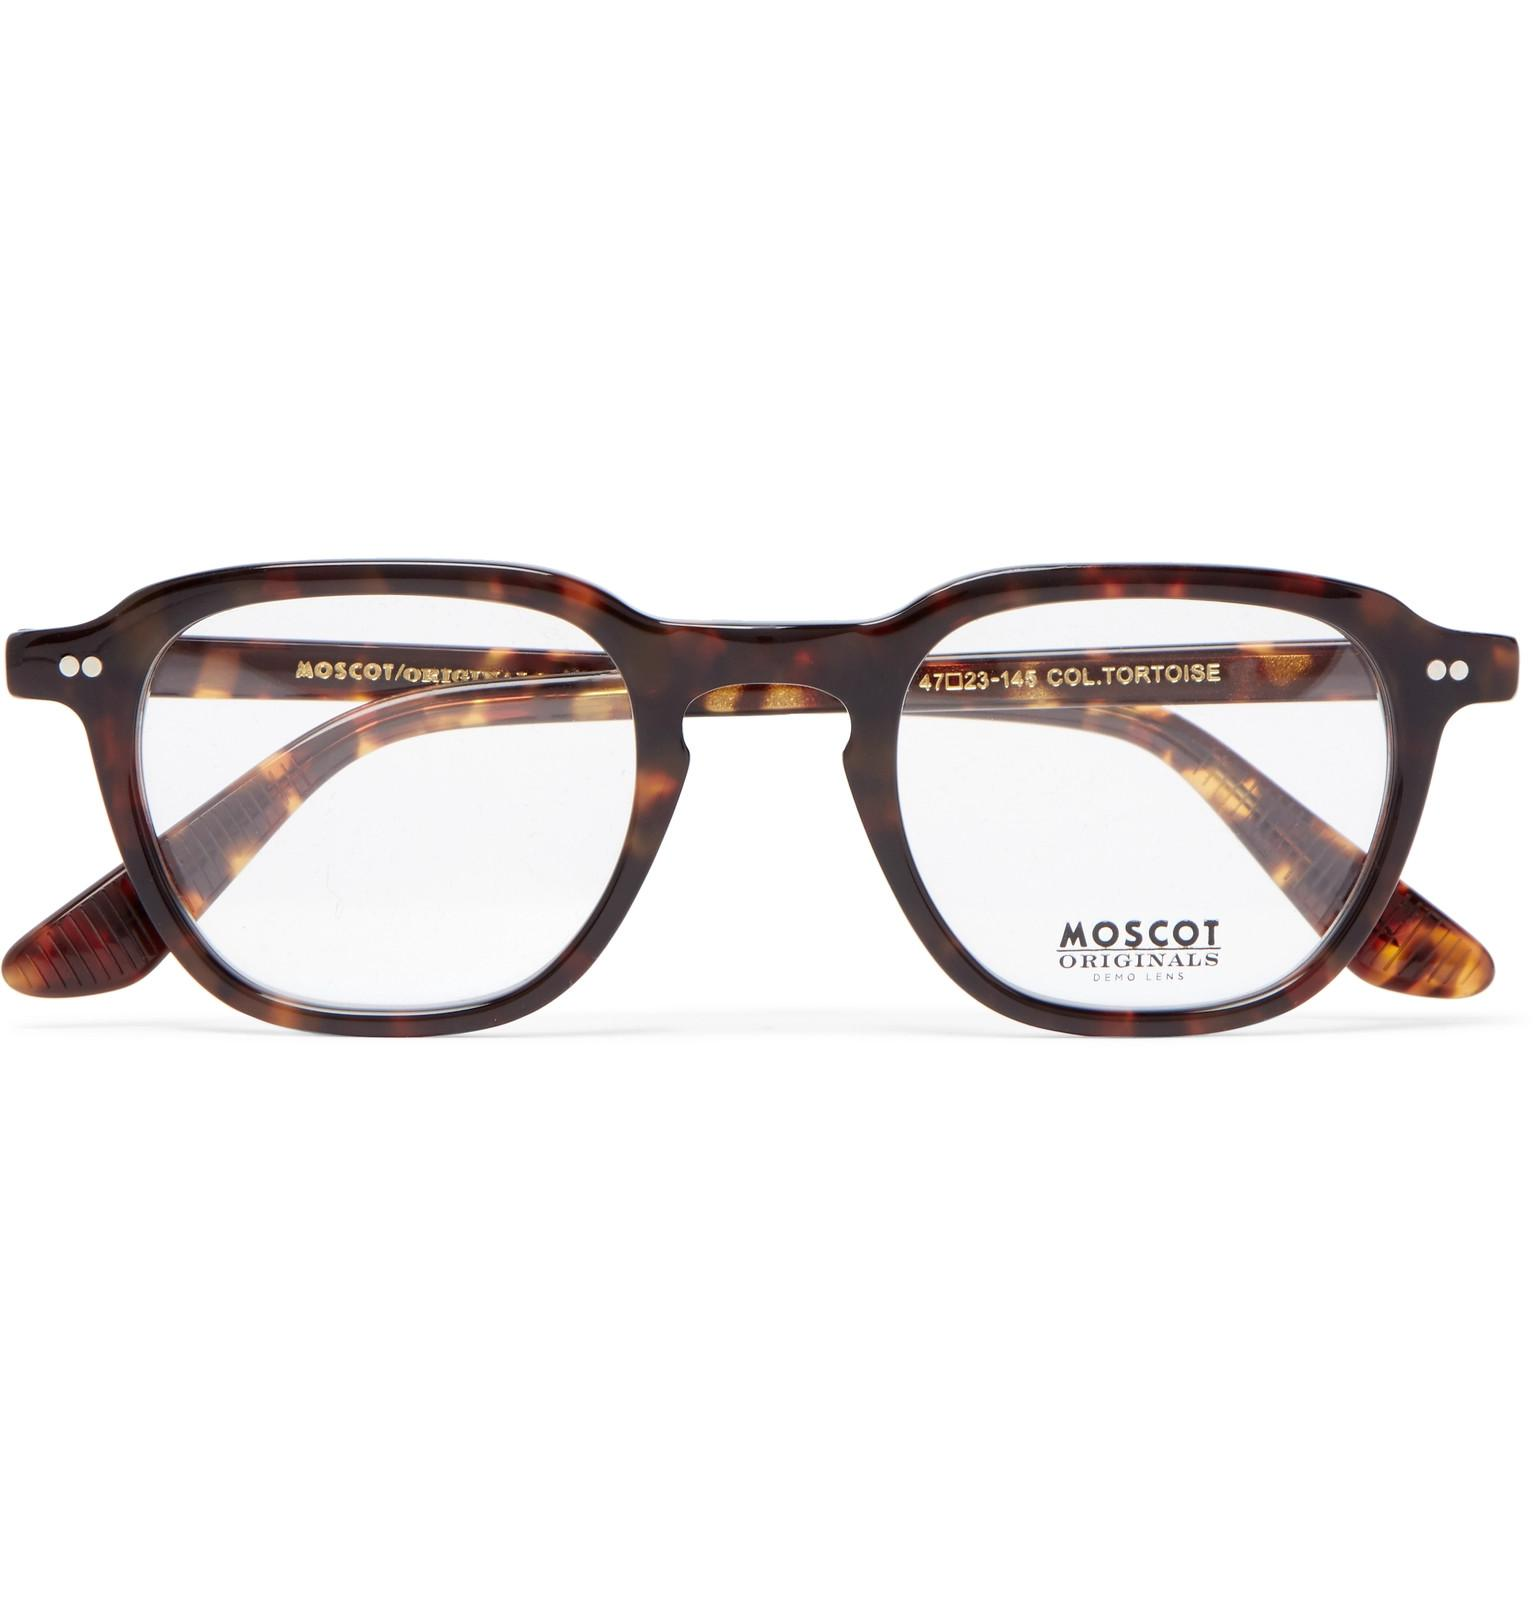 f04edba8ce3 Moscot Billik Round-frame Tortoiseshell Acetate Optical Glasses in ...